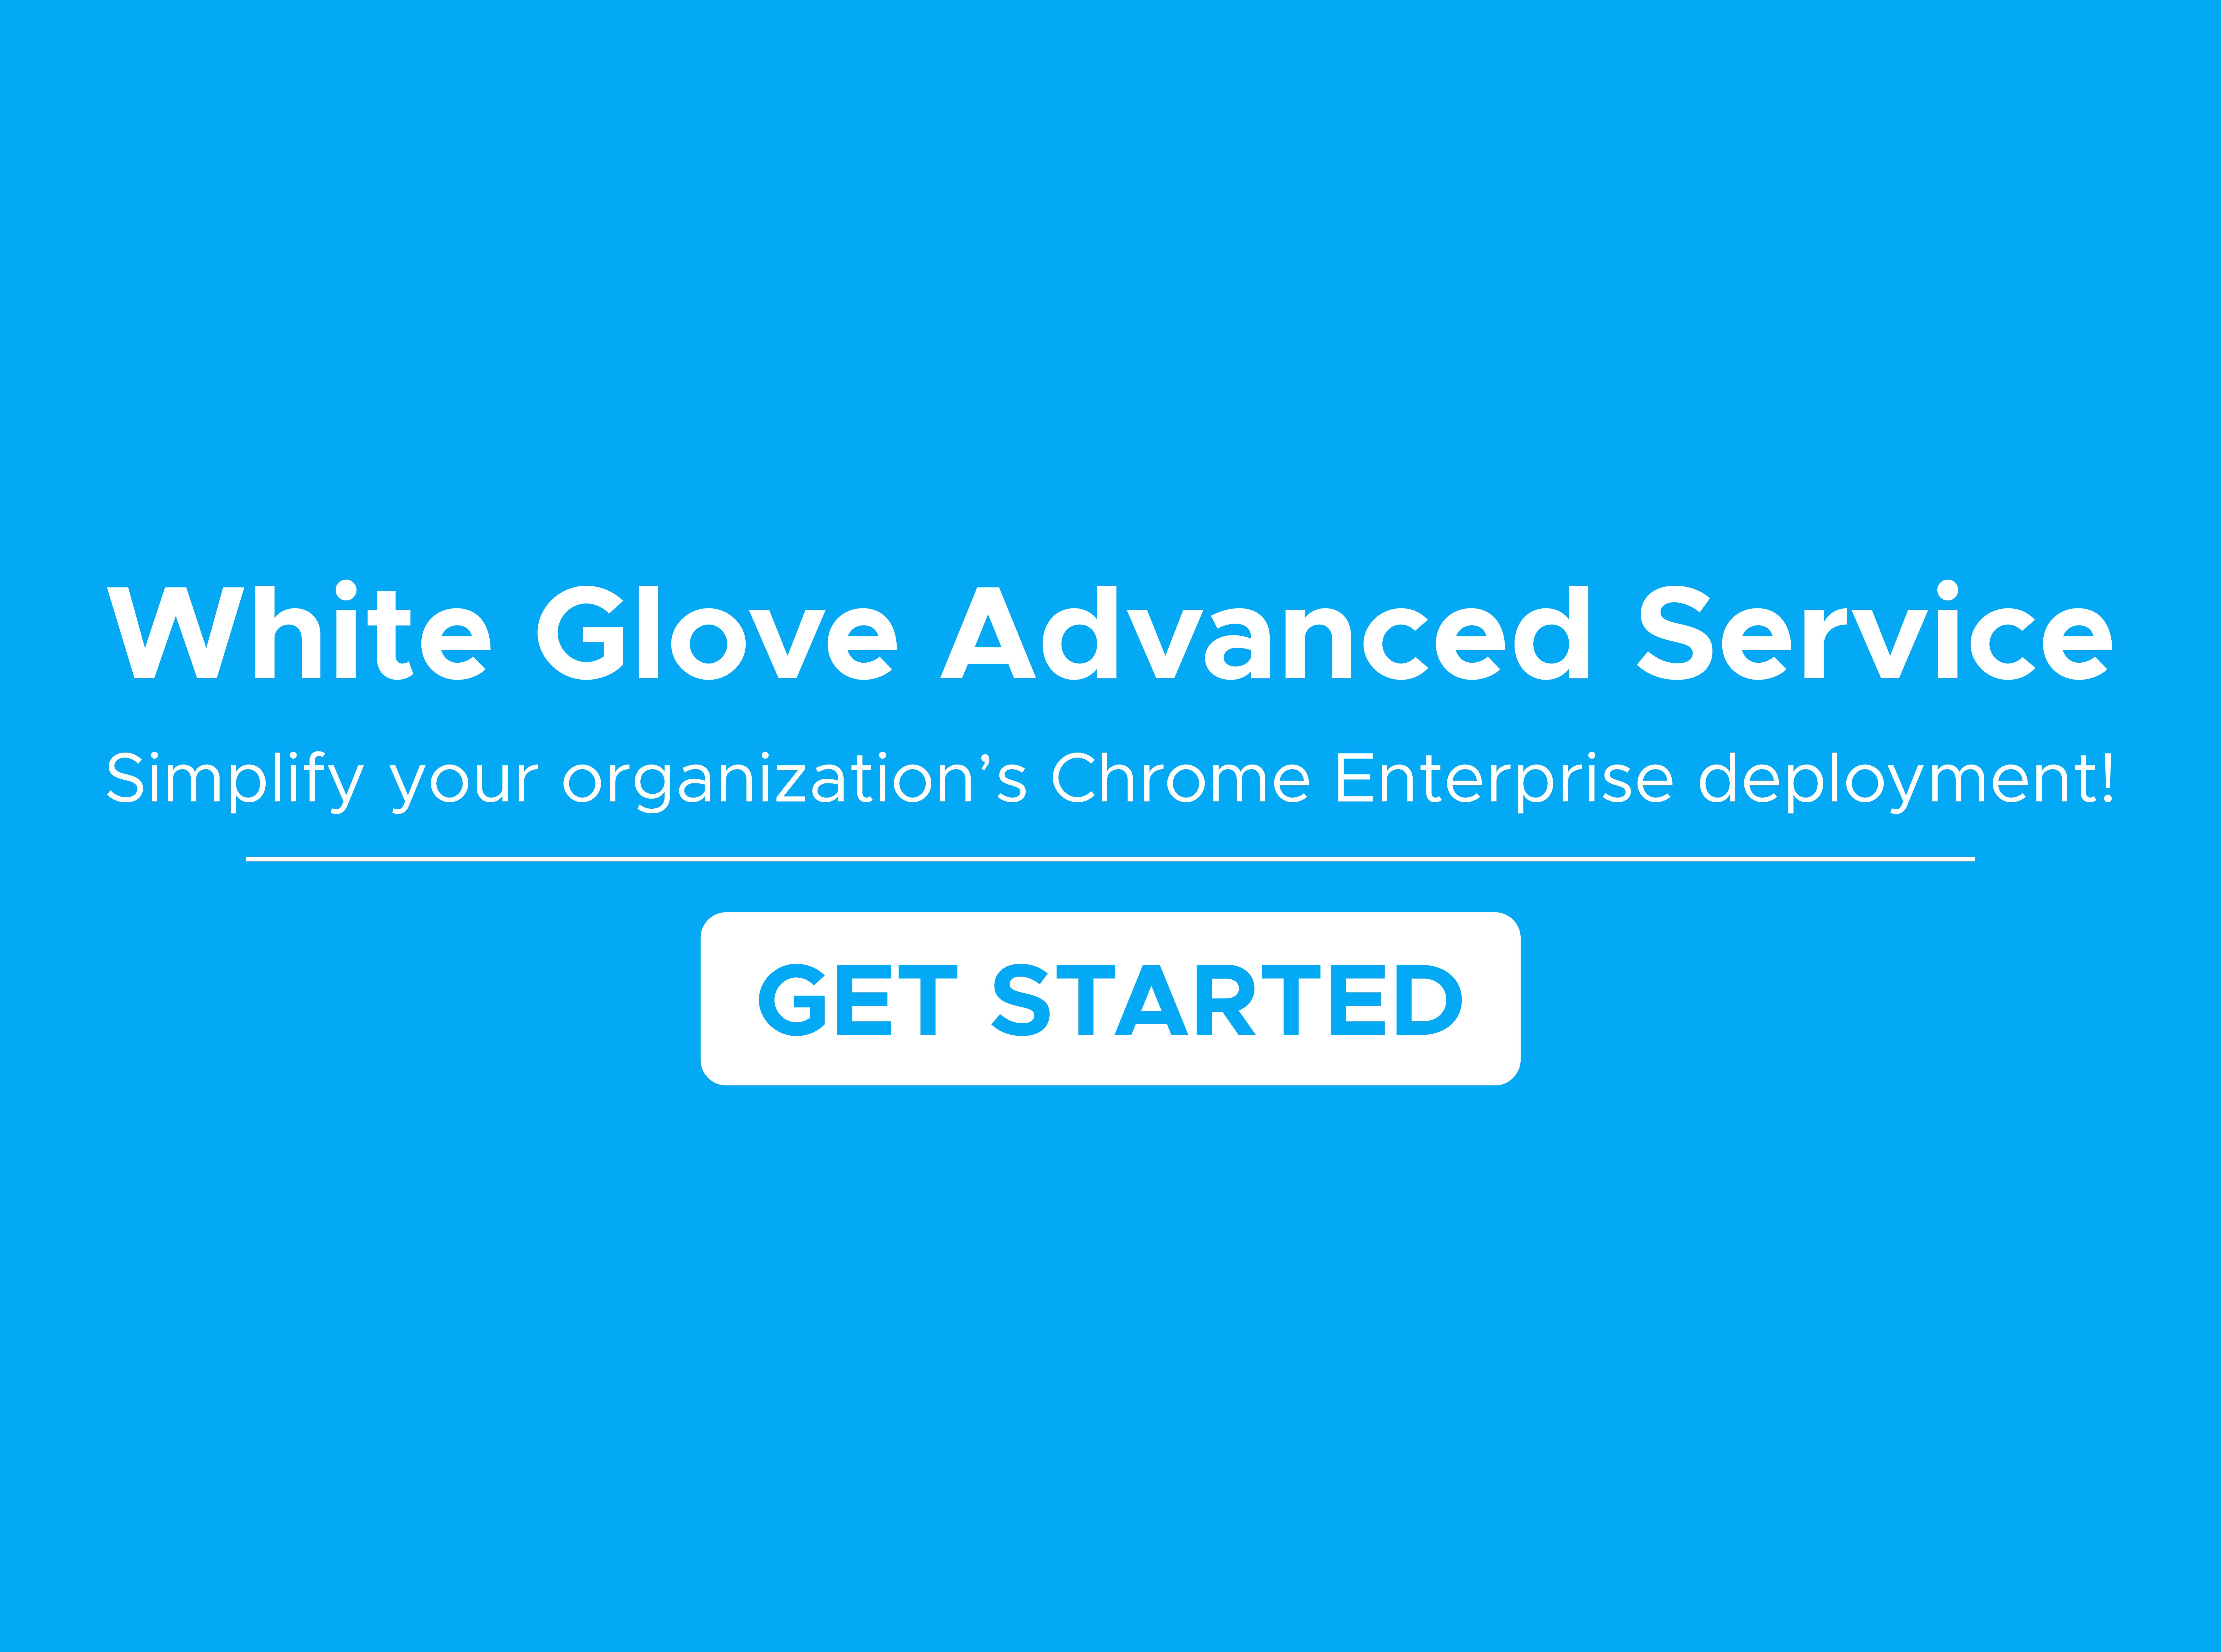 White Glove Advanced Service